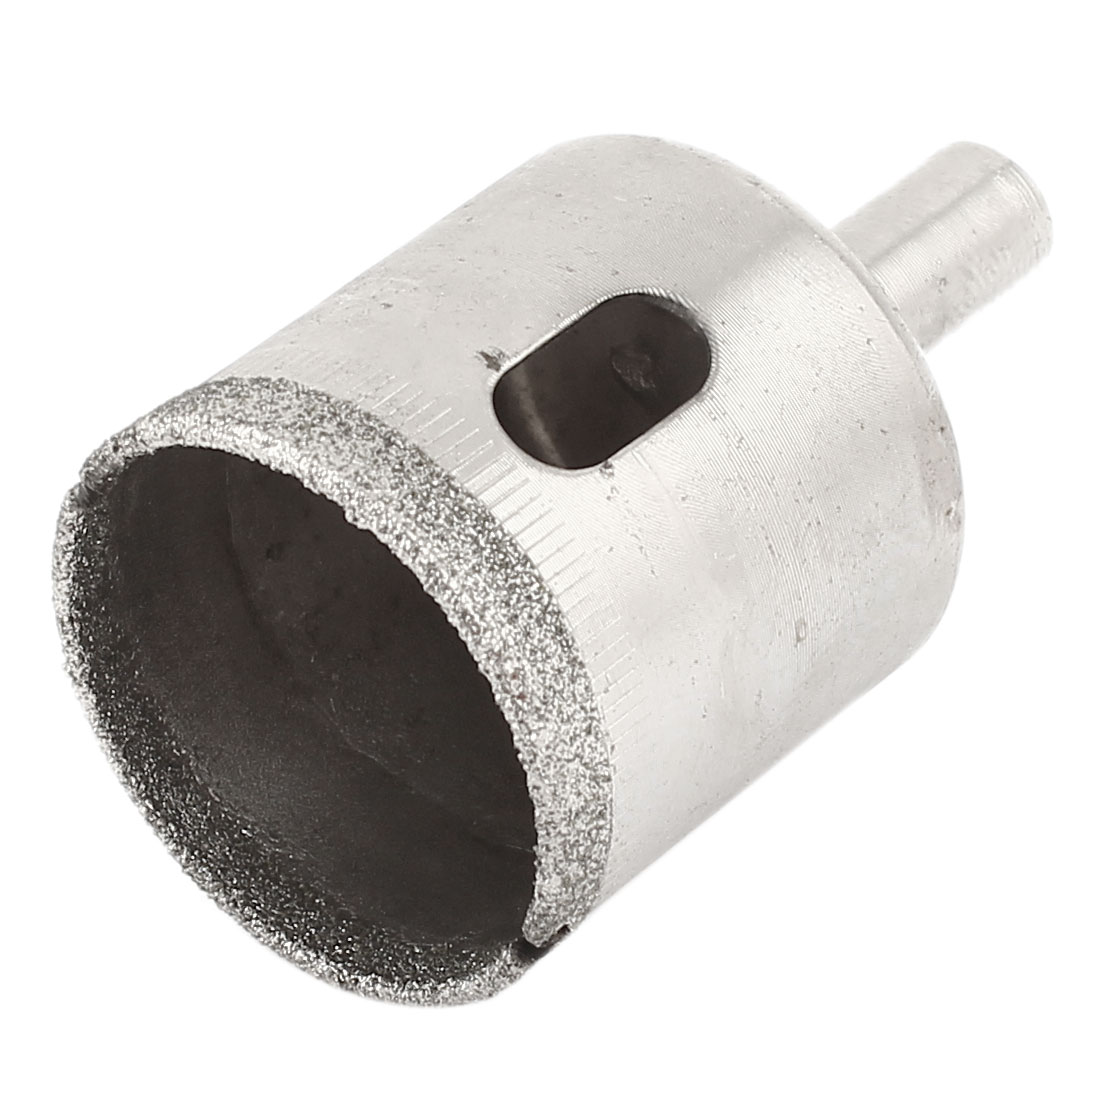 Metal 30mm Diamond Coated Glass Ceramic Hole Saw Cutter Tool